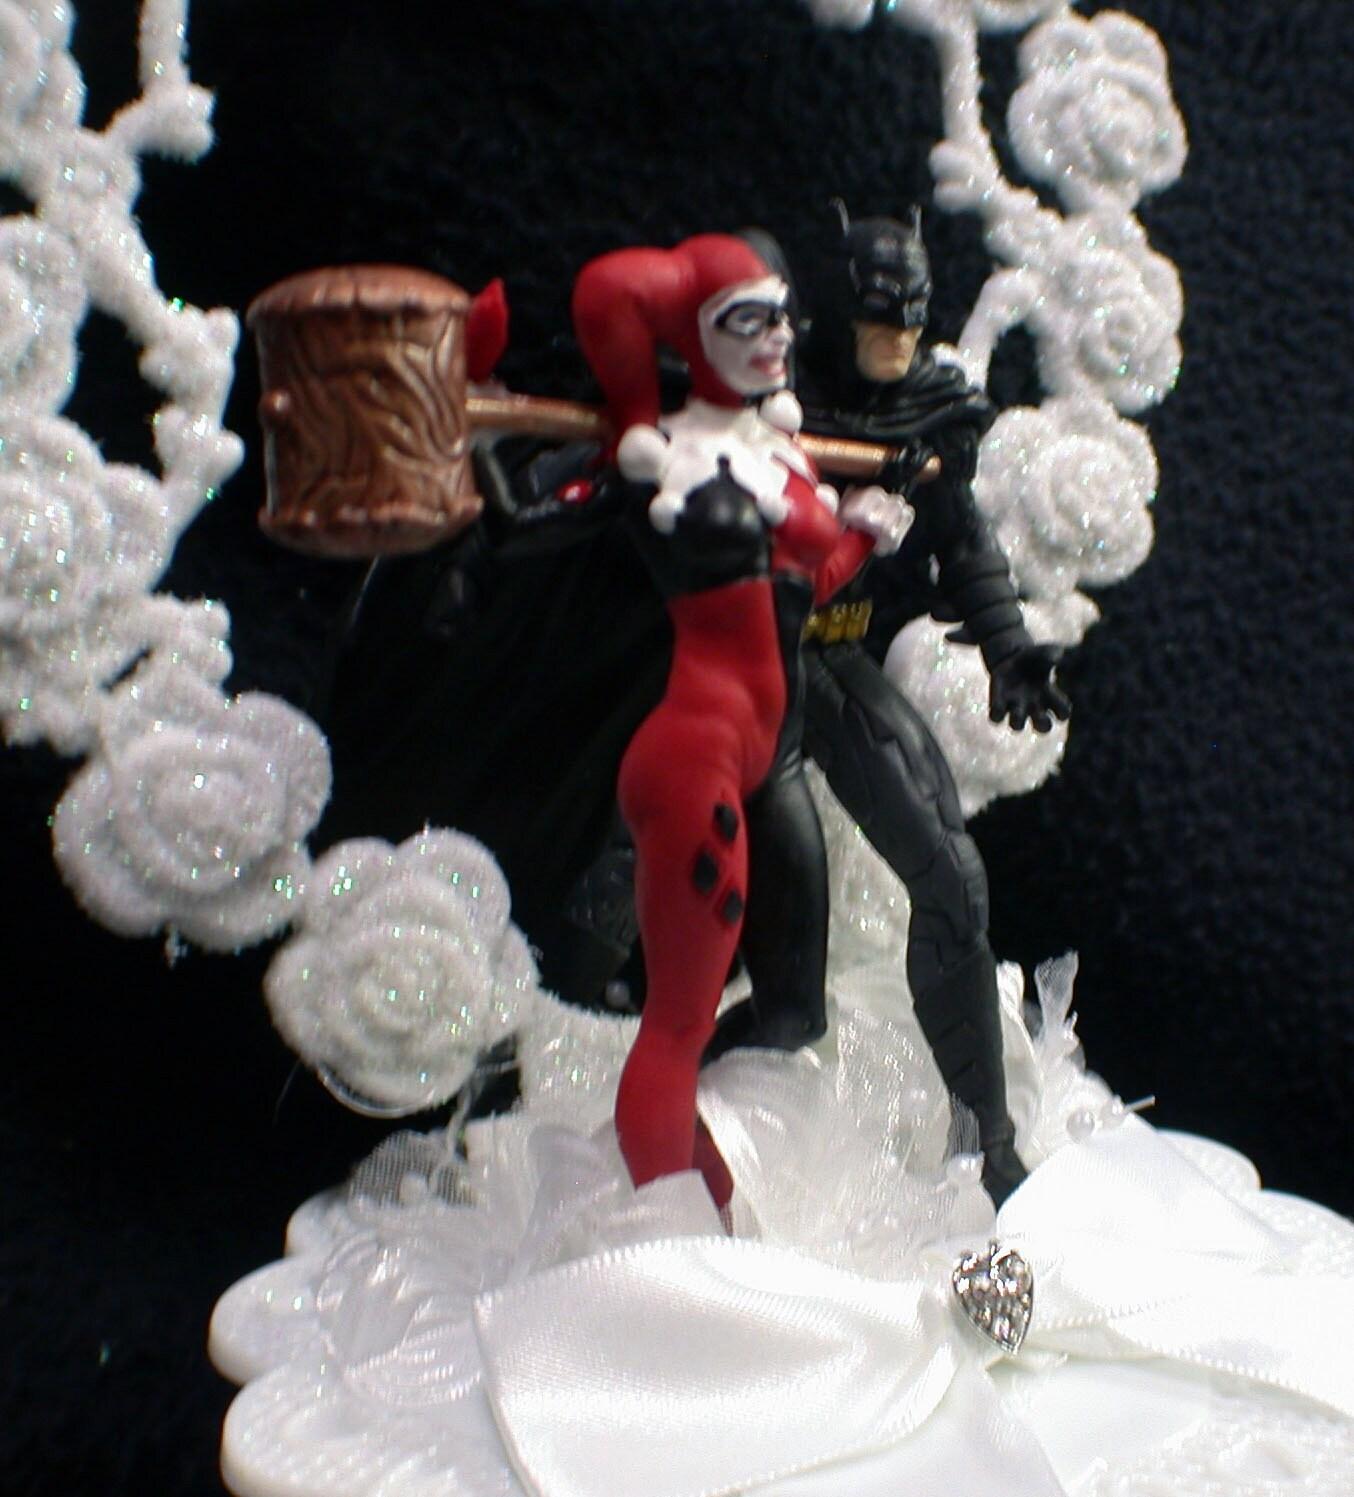 Batman & Harley Quinn DC Comic Wedding Cake By YourCakeTopper